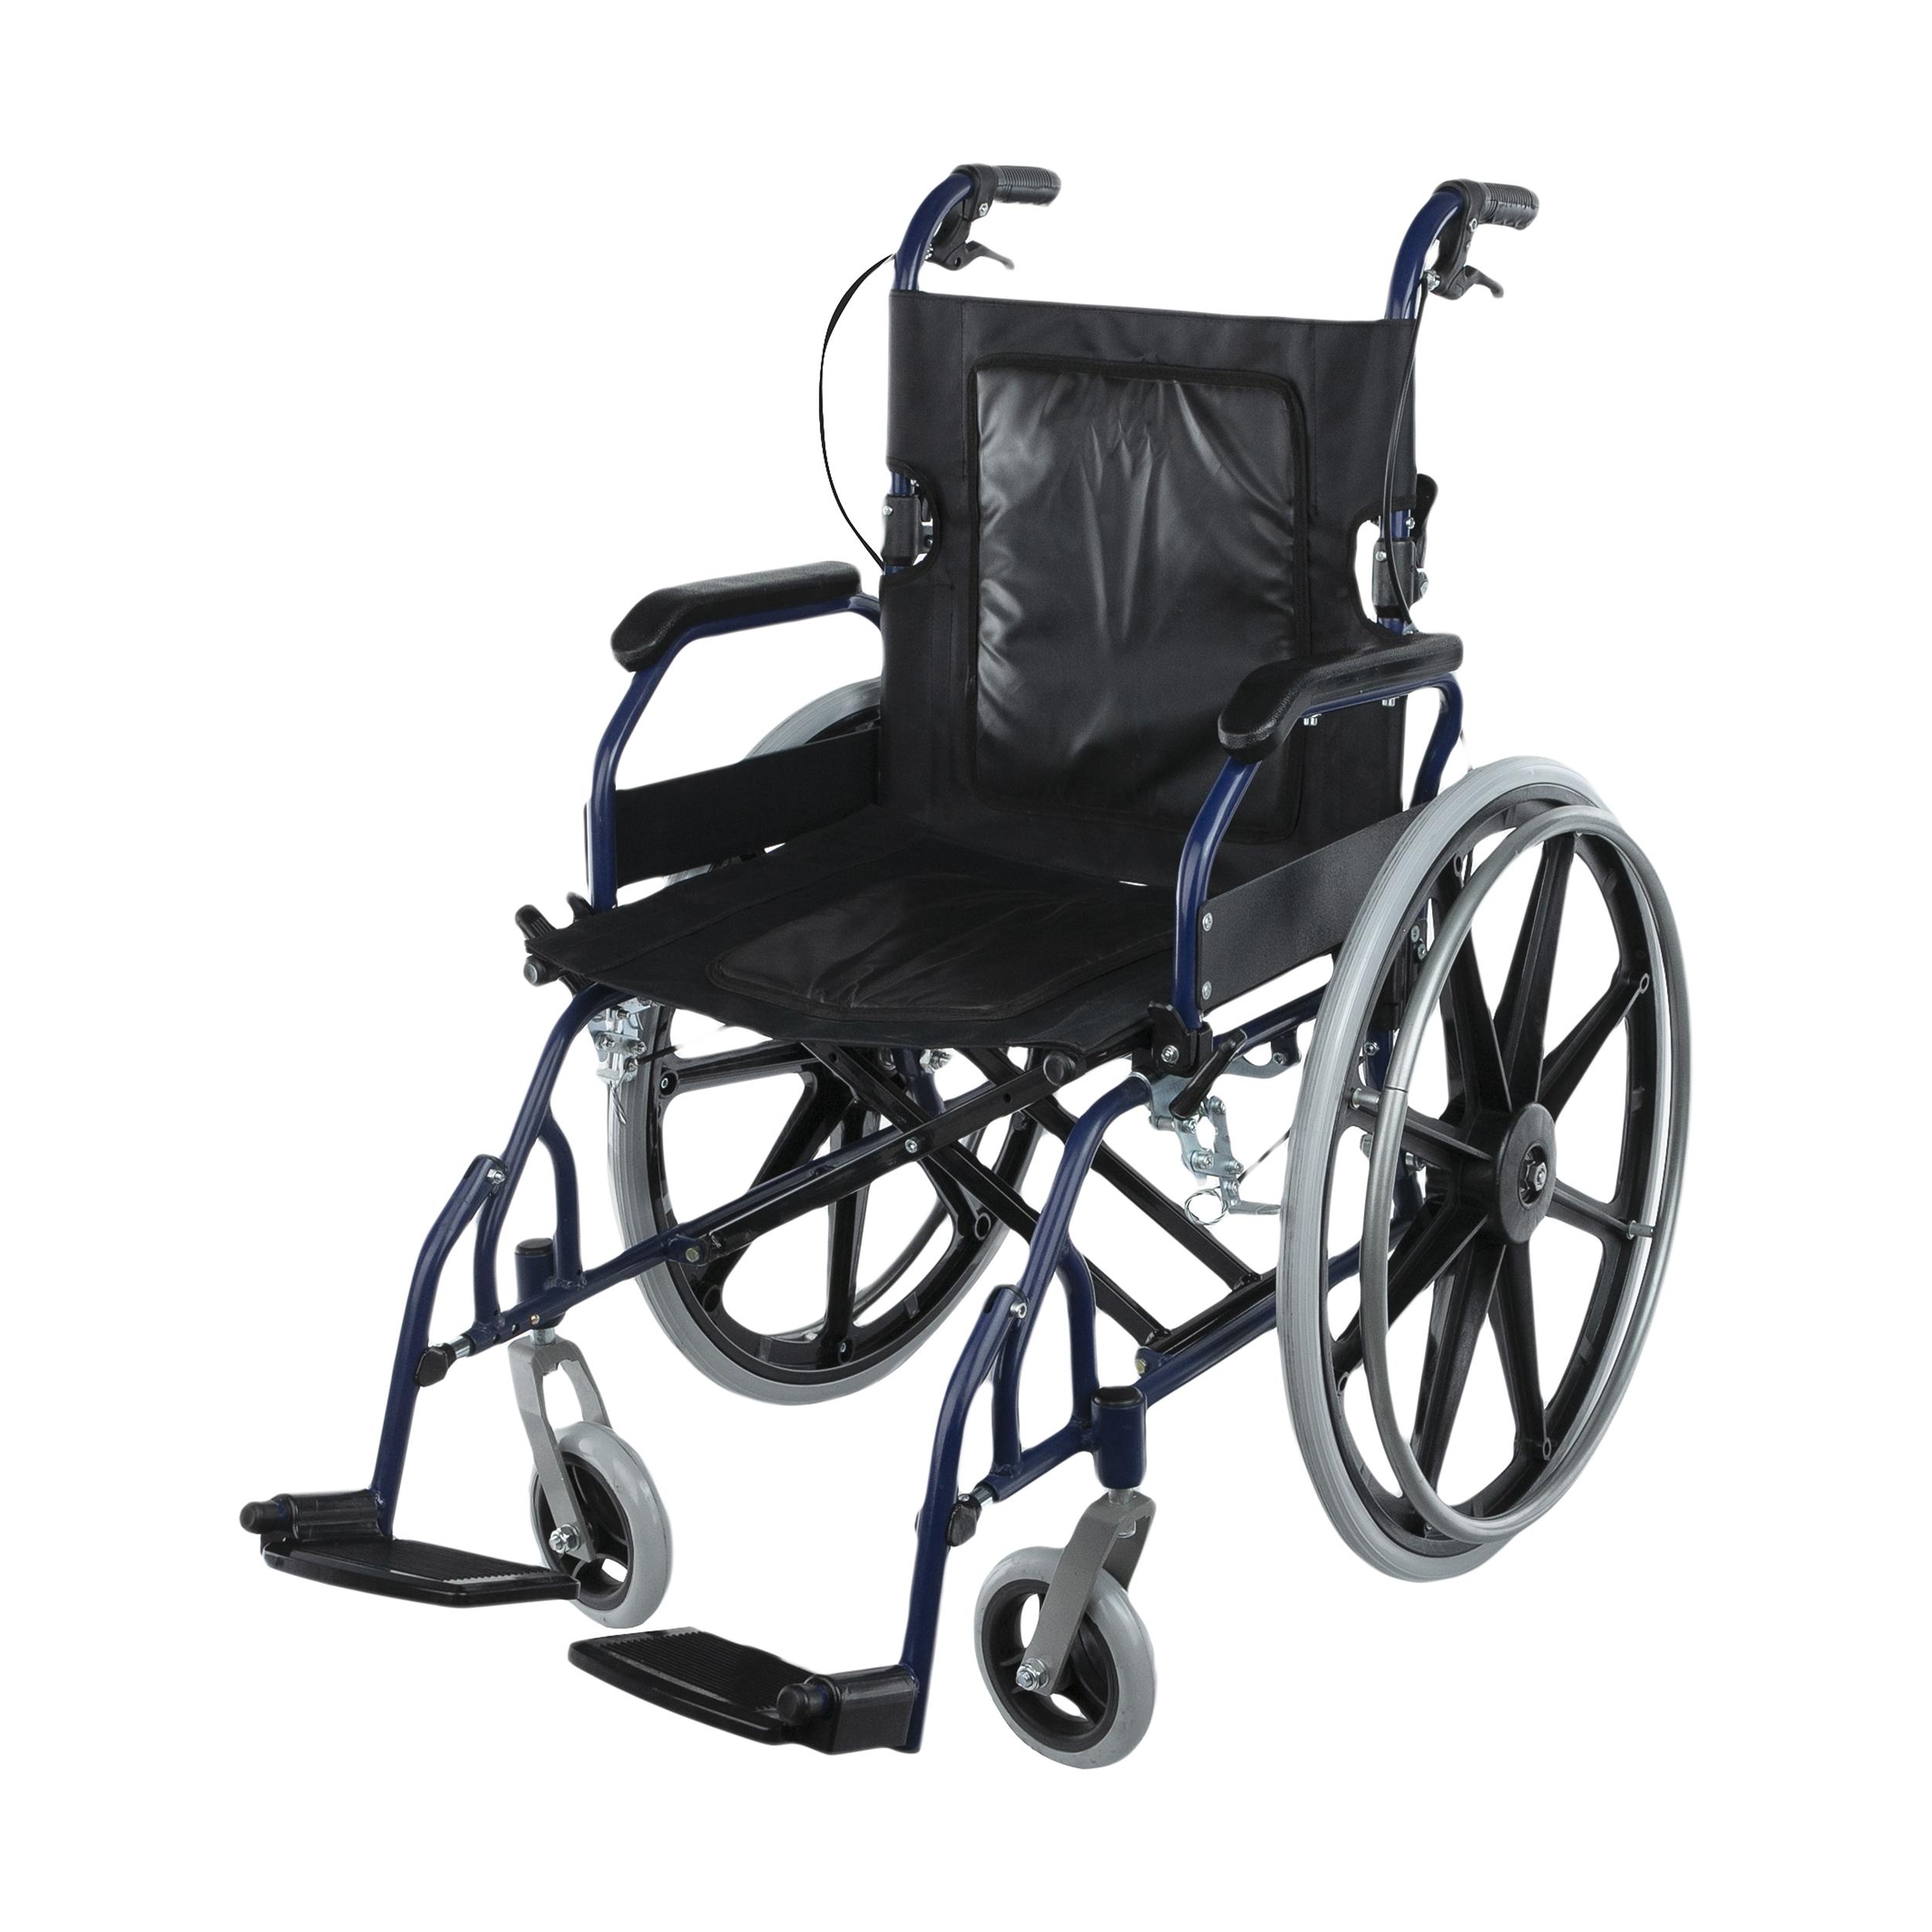 ویلچر مدعیسی مدل IR101